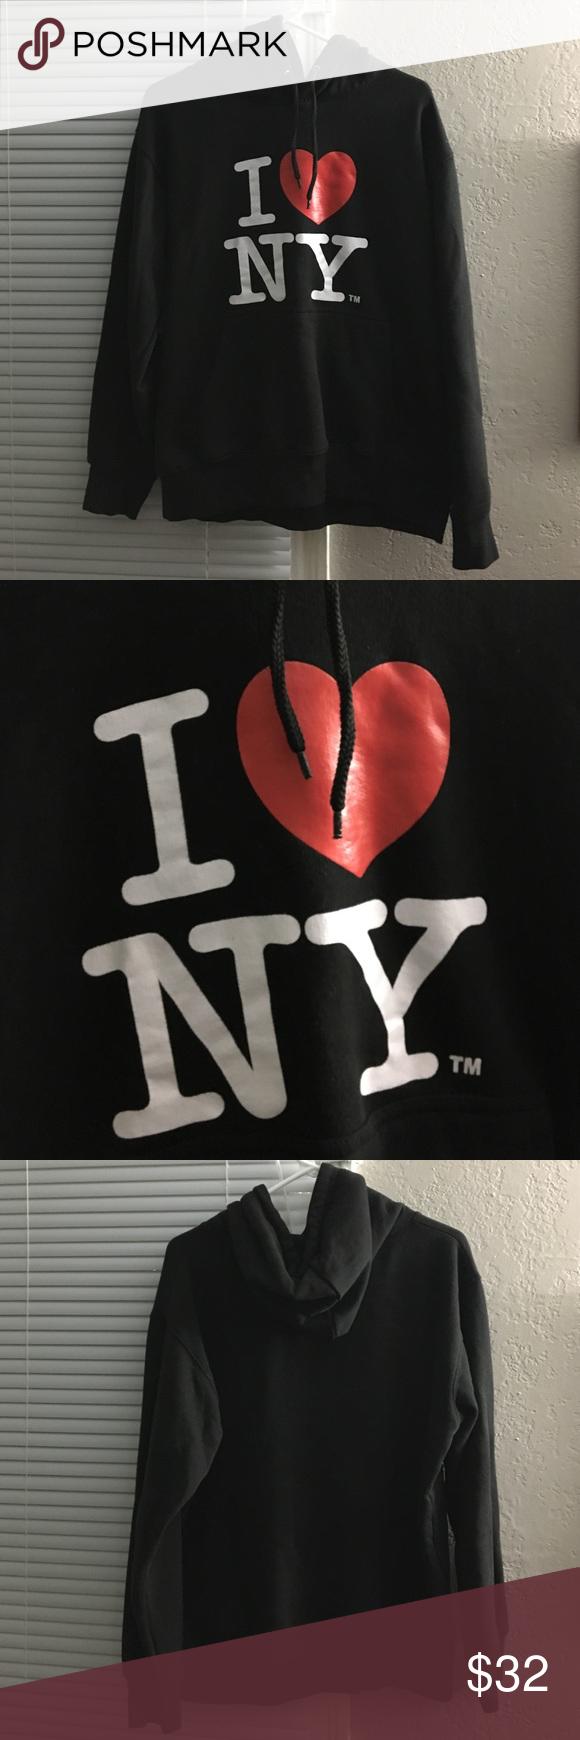 Black I ❤️ NY Hoodie I <3 NY hoodie, black, worn very little, like new. I love NYC. I ❤️ NY Tops Sweatshirts & Hoodies